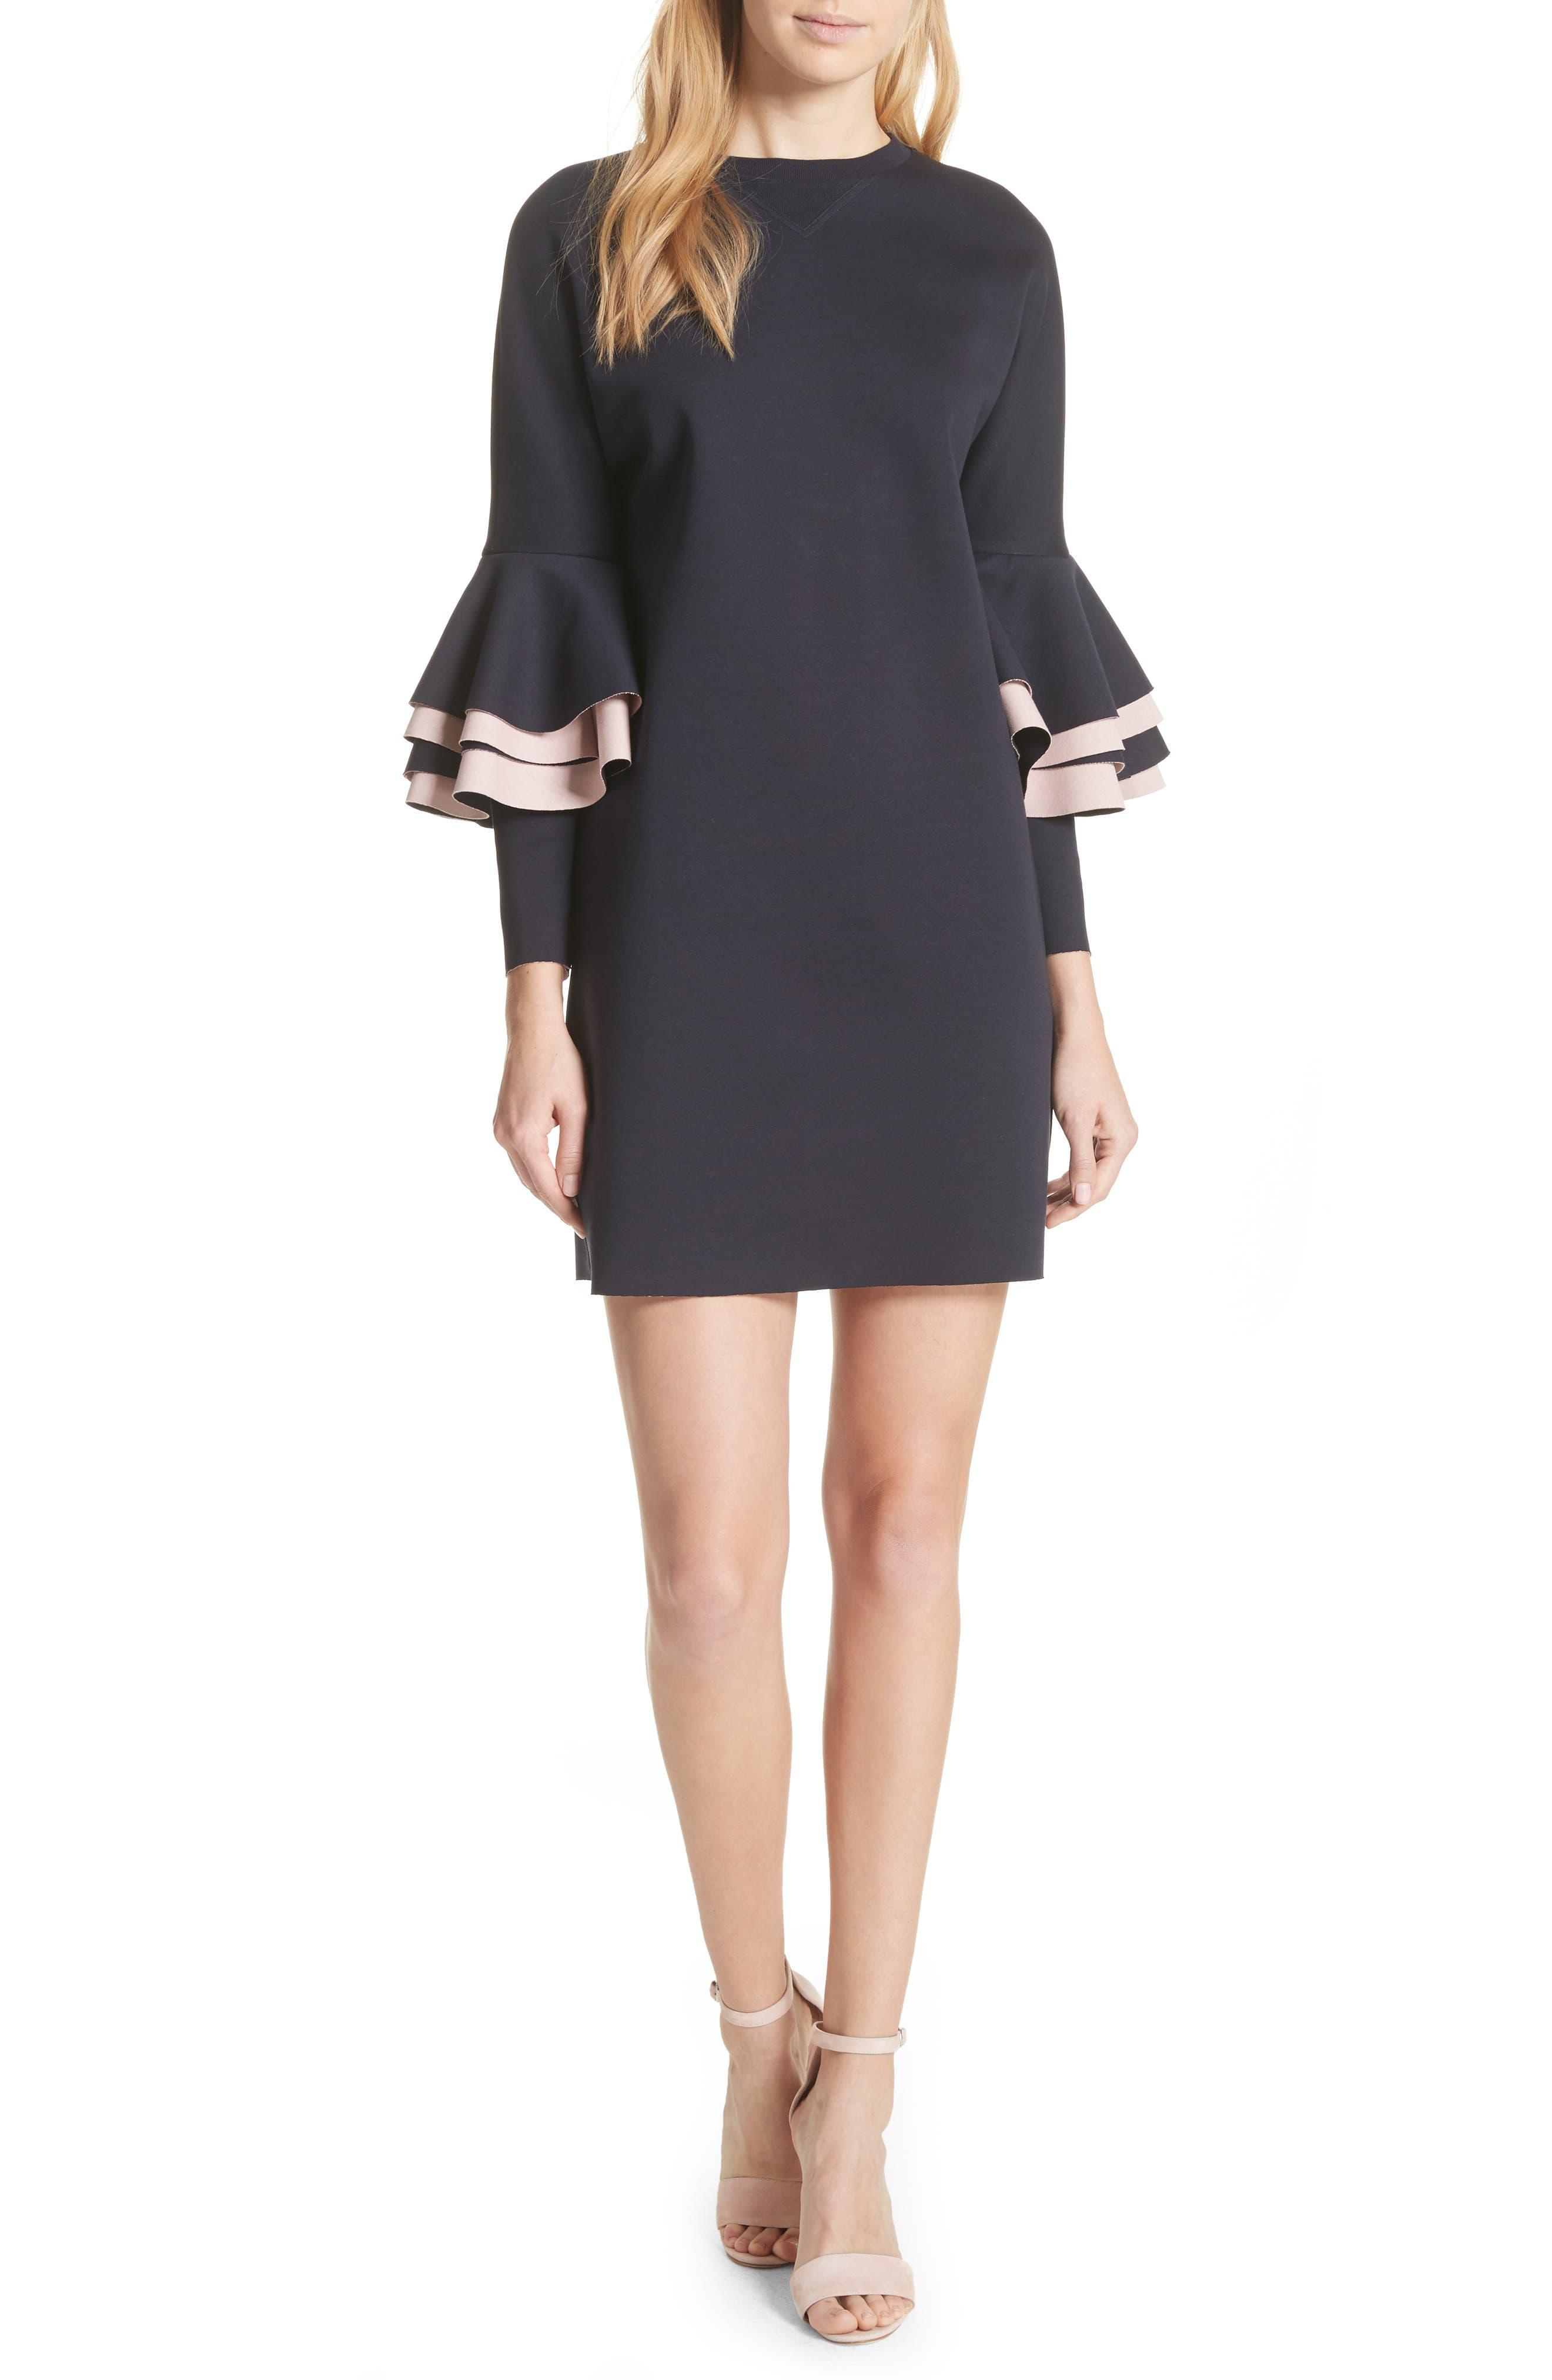 Chloae Frill Sleeve Sweatshirt Dress,                             Main thumbnail 1, color,                             410